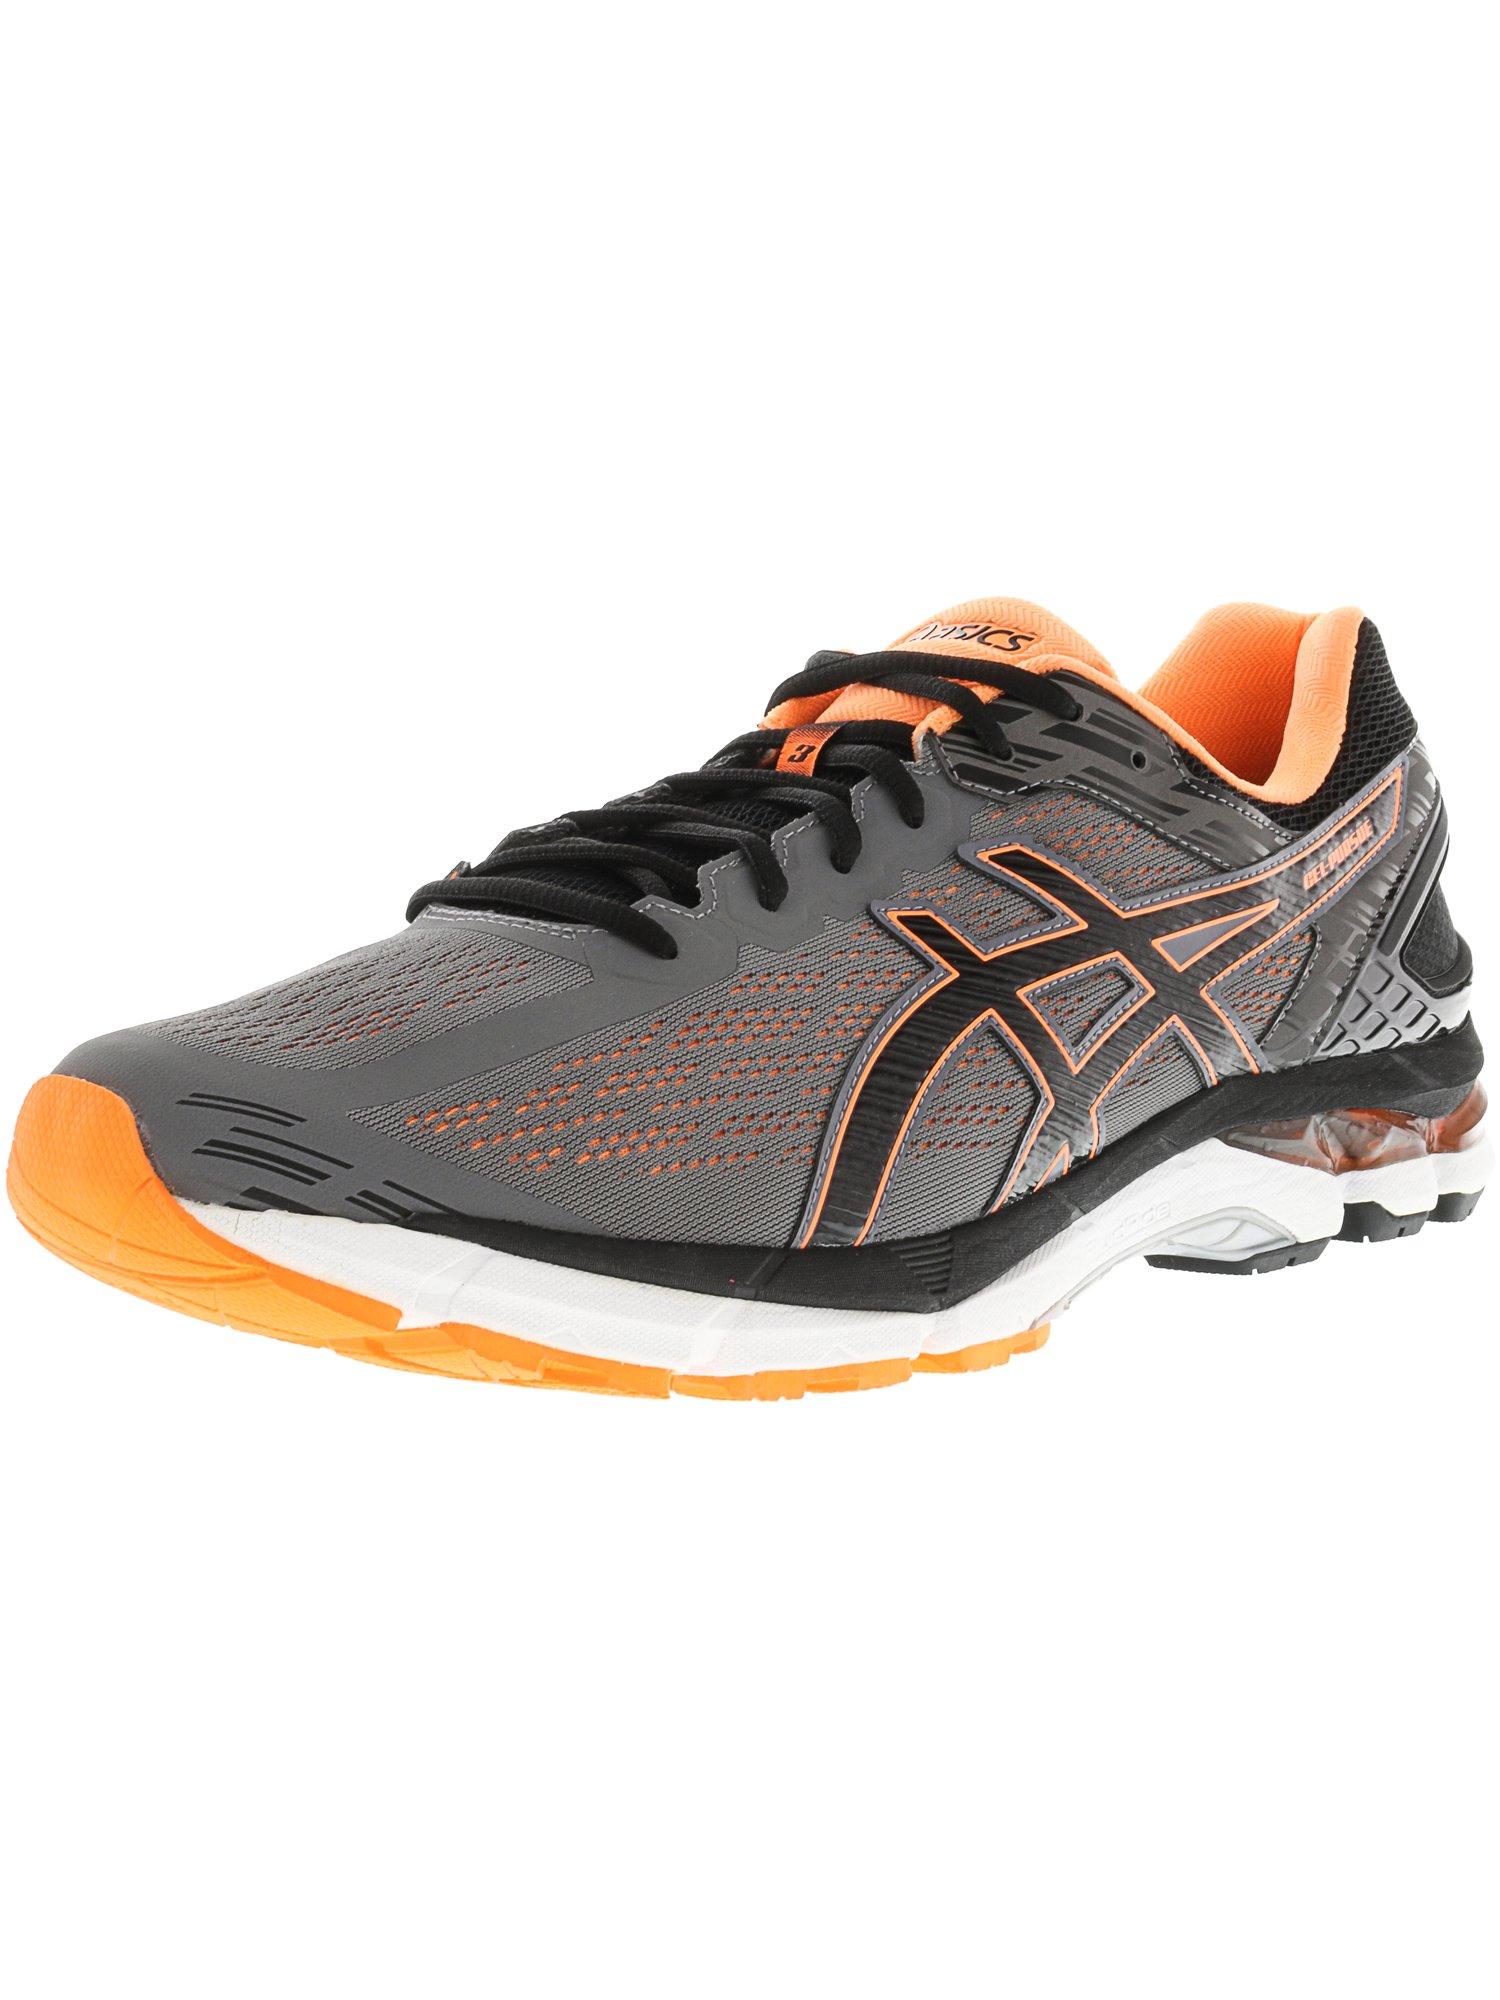 Asics Men's Gel-Pursue 3 Carbon / Black Hot Orange Ankle-High Fabric Running Shoe - 12.5M